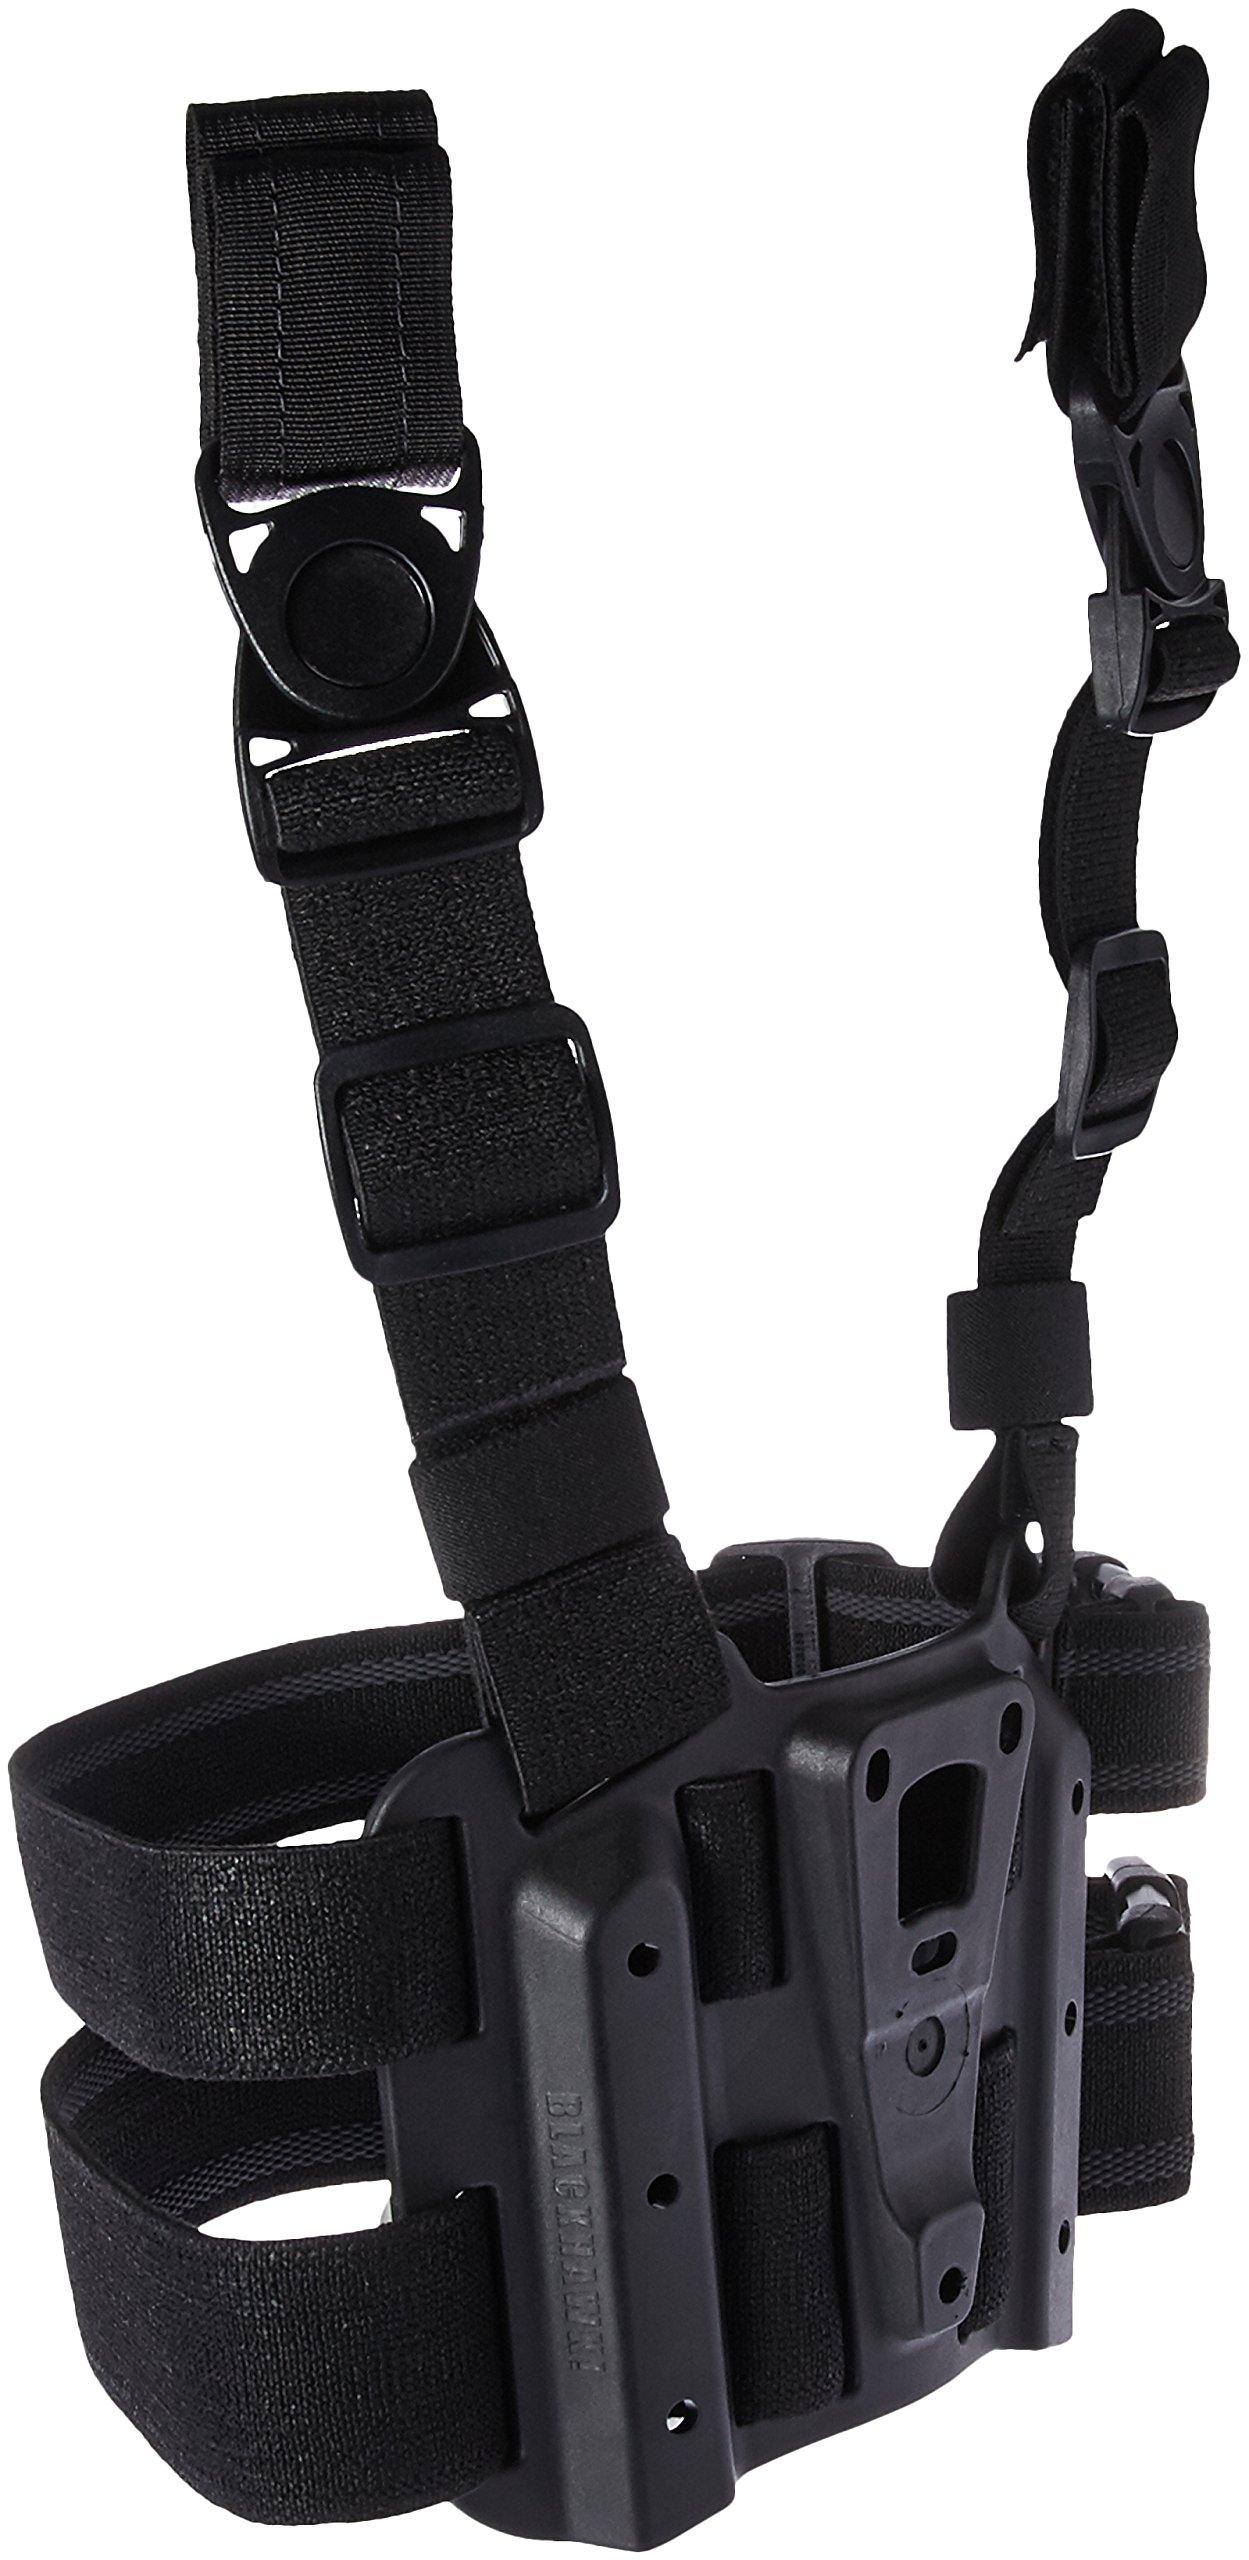 BLACKHAWK! 432000PBK Tactical Holster Platform, Black by BLACKHAWK! (Image #1)